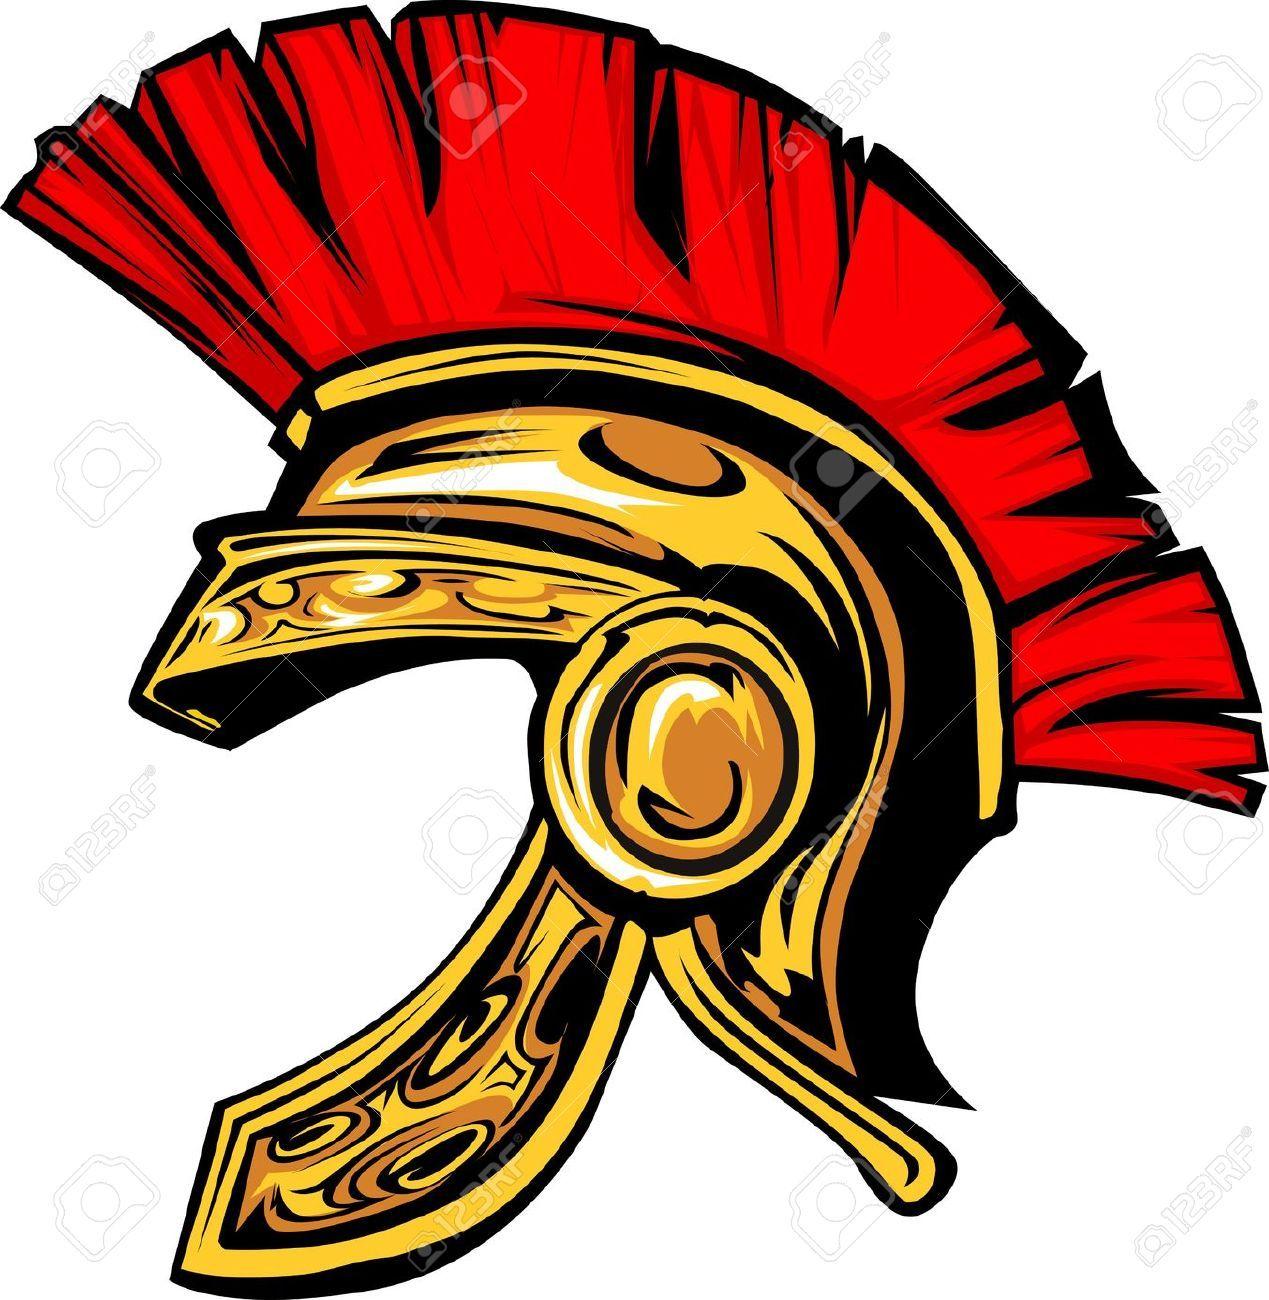 trojan warrior cartoon.